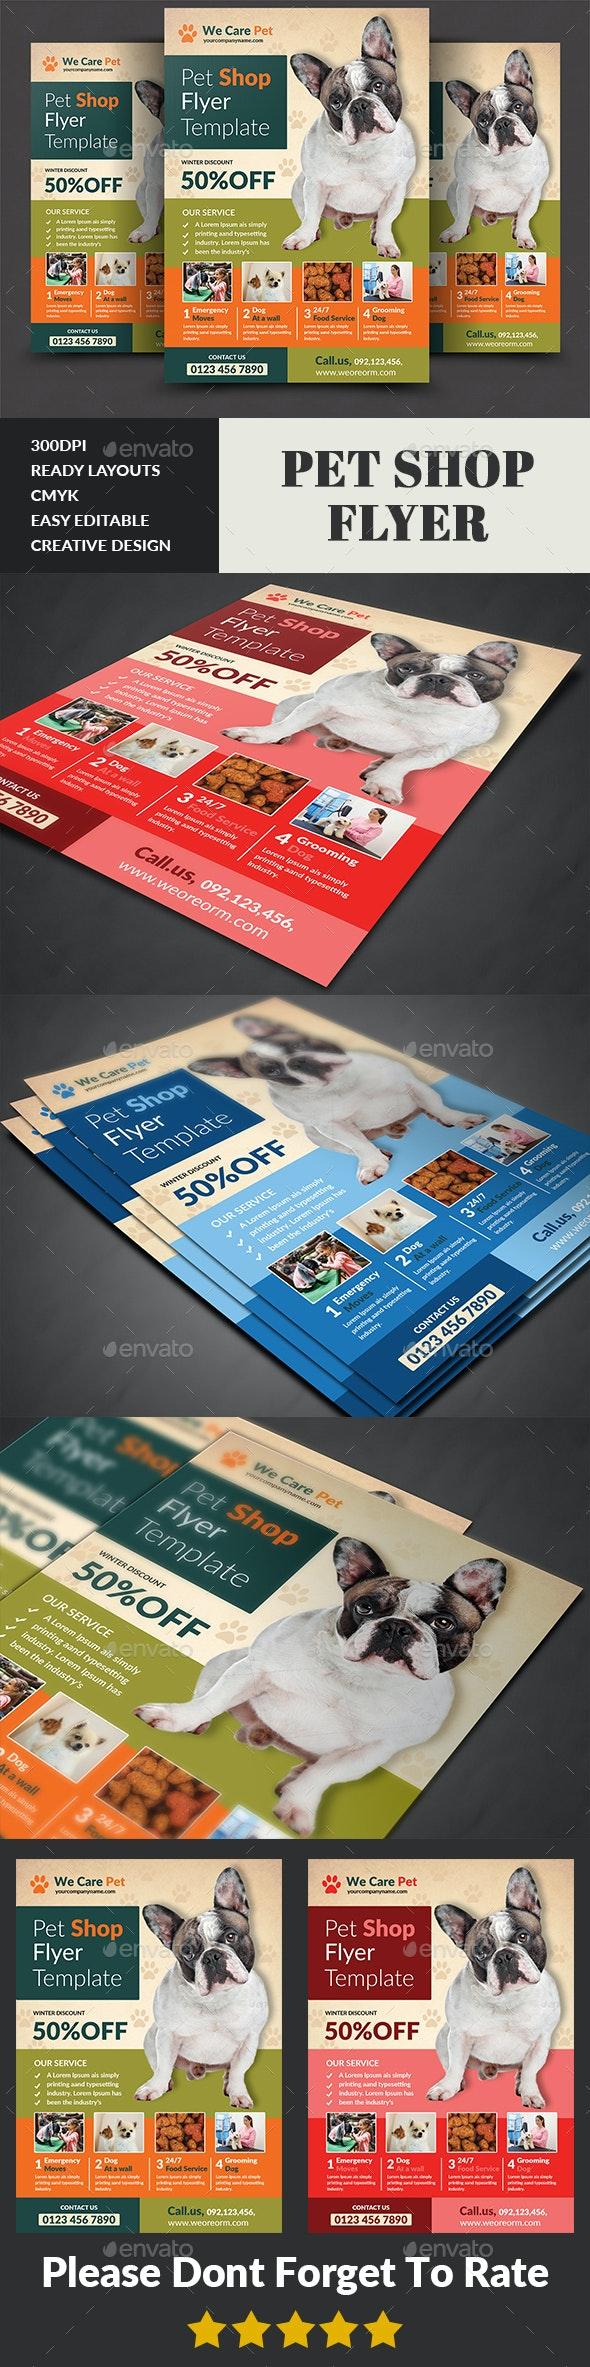 Pet Shop Flyer Template - Corporate Flyers